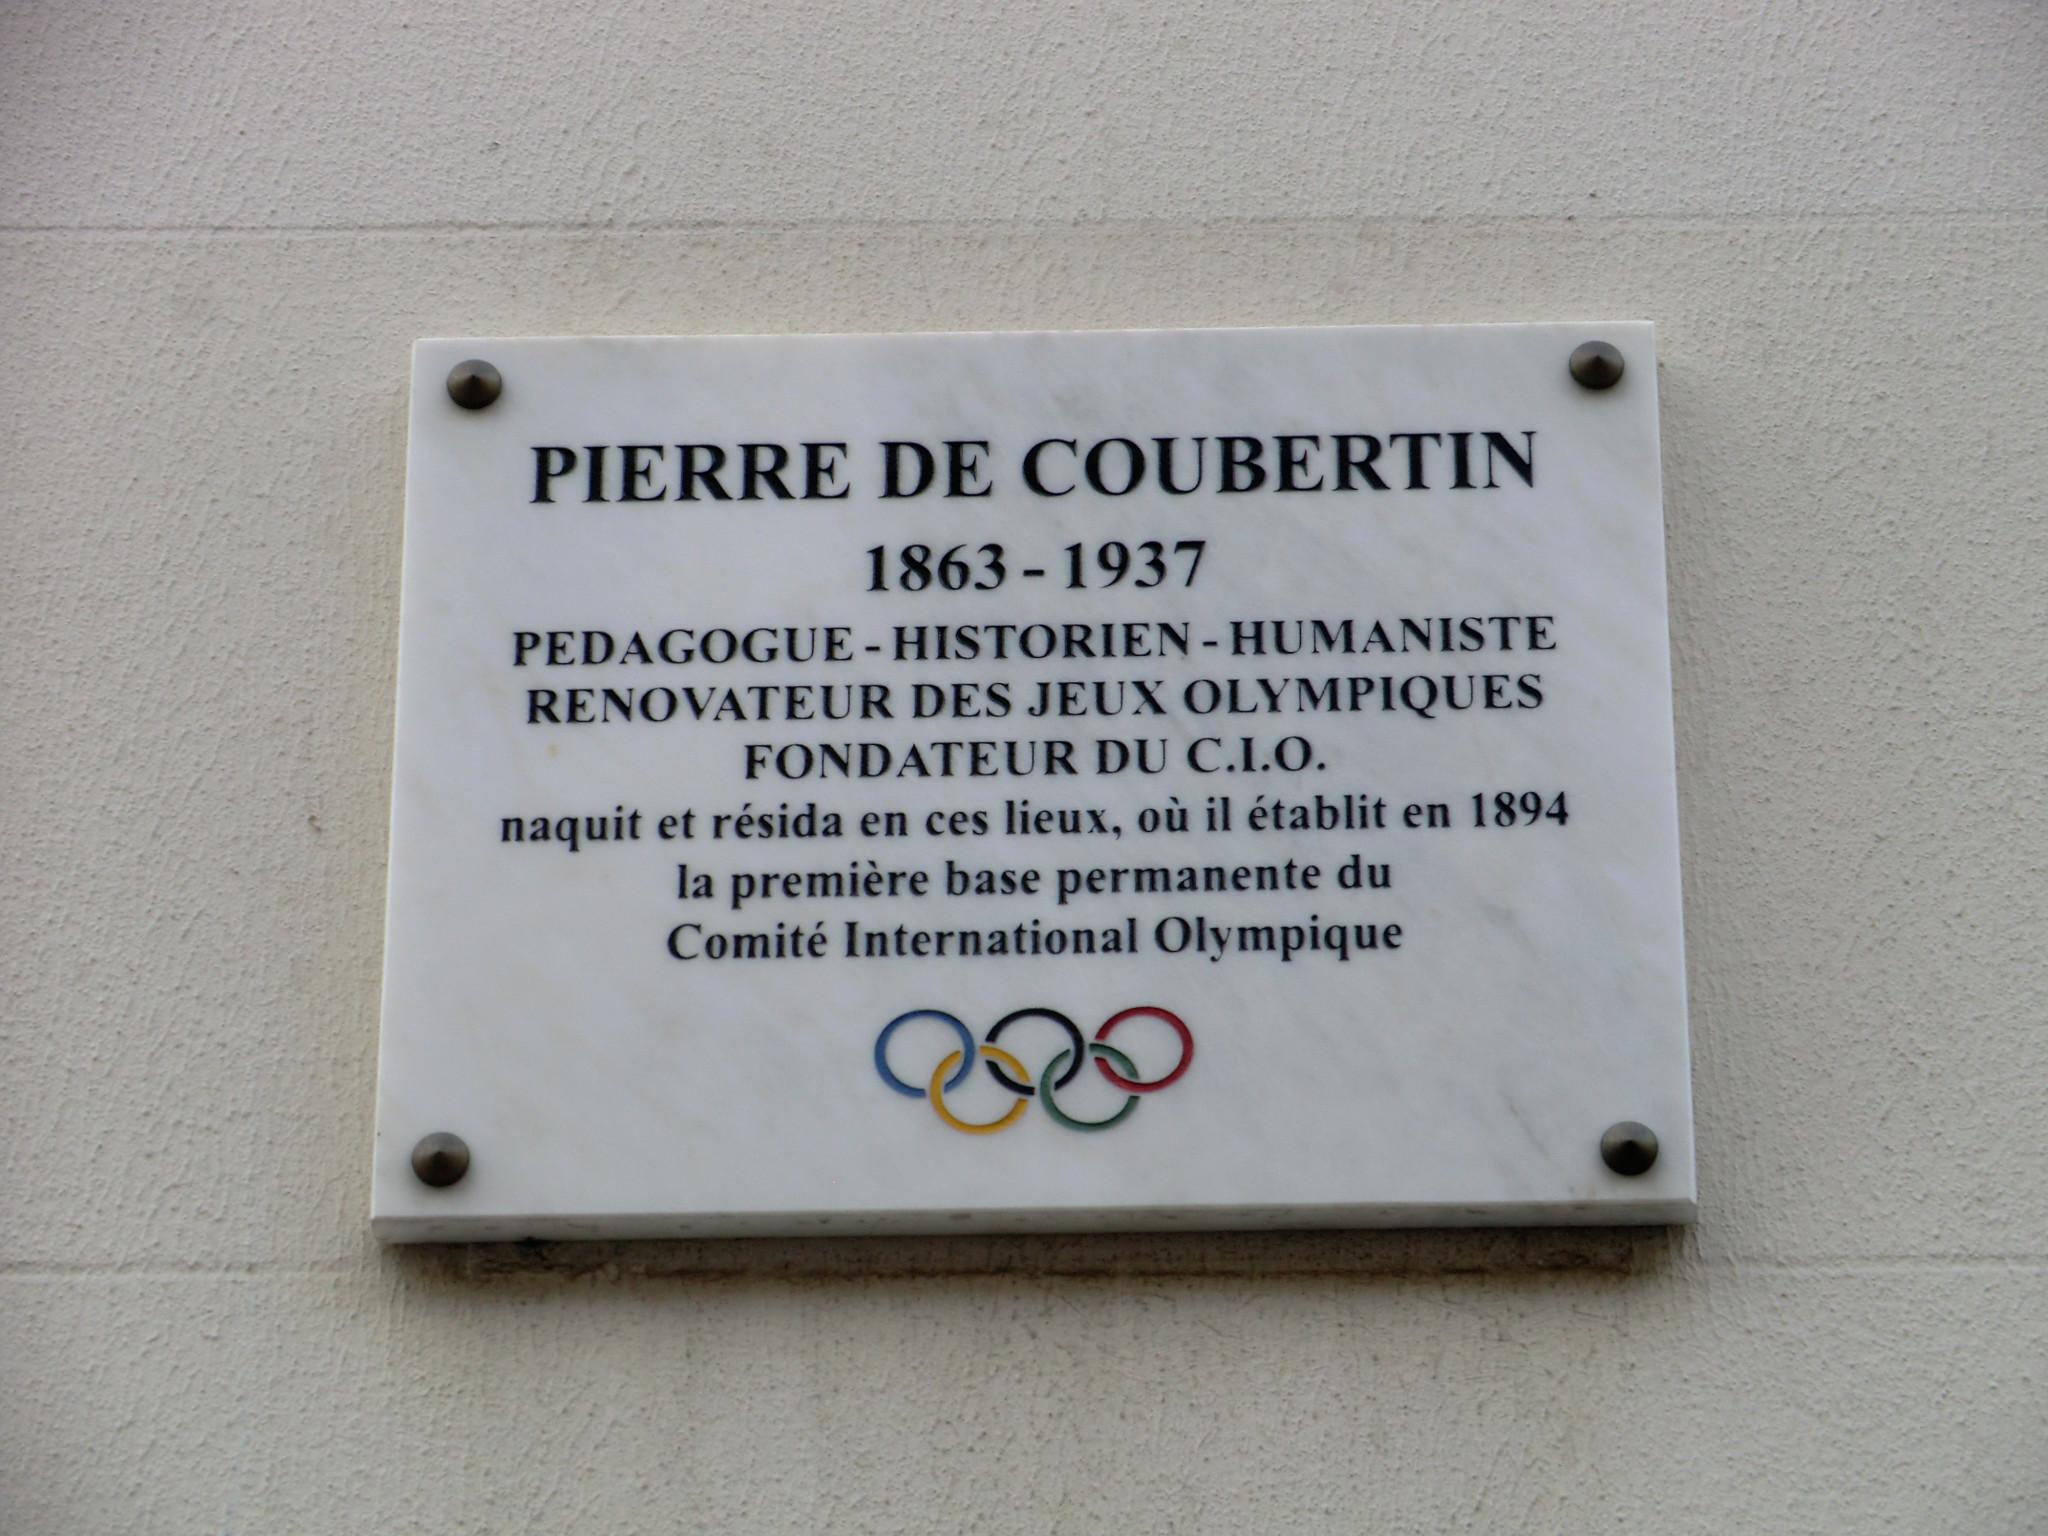 A plaque commemorating the birthplace of Pierre de Coubertin in Paris ©Philip Barker